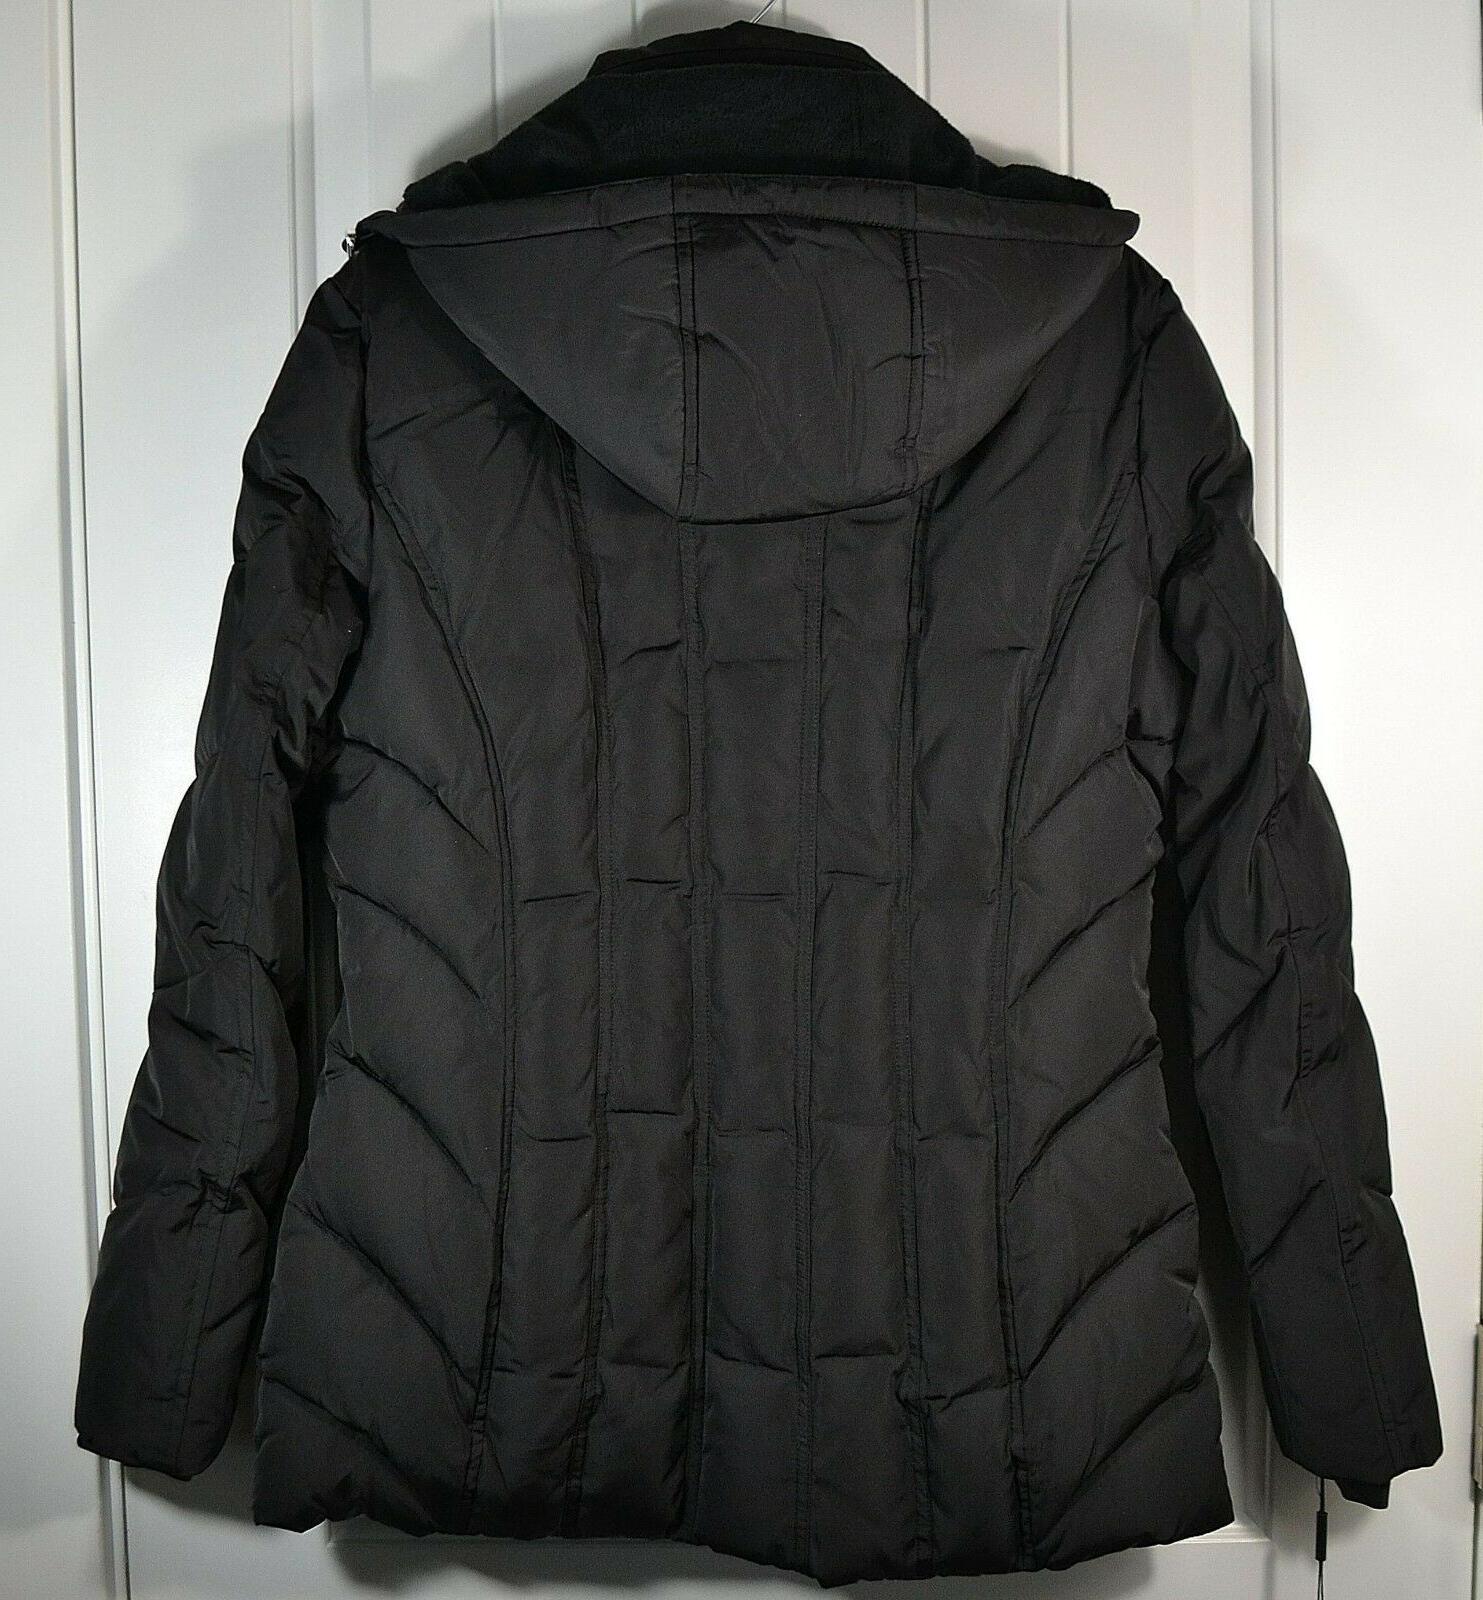 NWT CALVIN BLACK ZIP JACKET COAT SZ CW903582